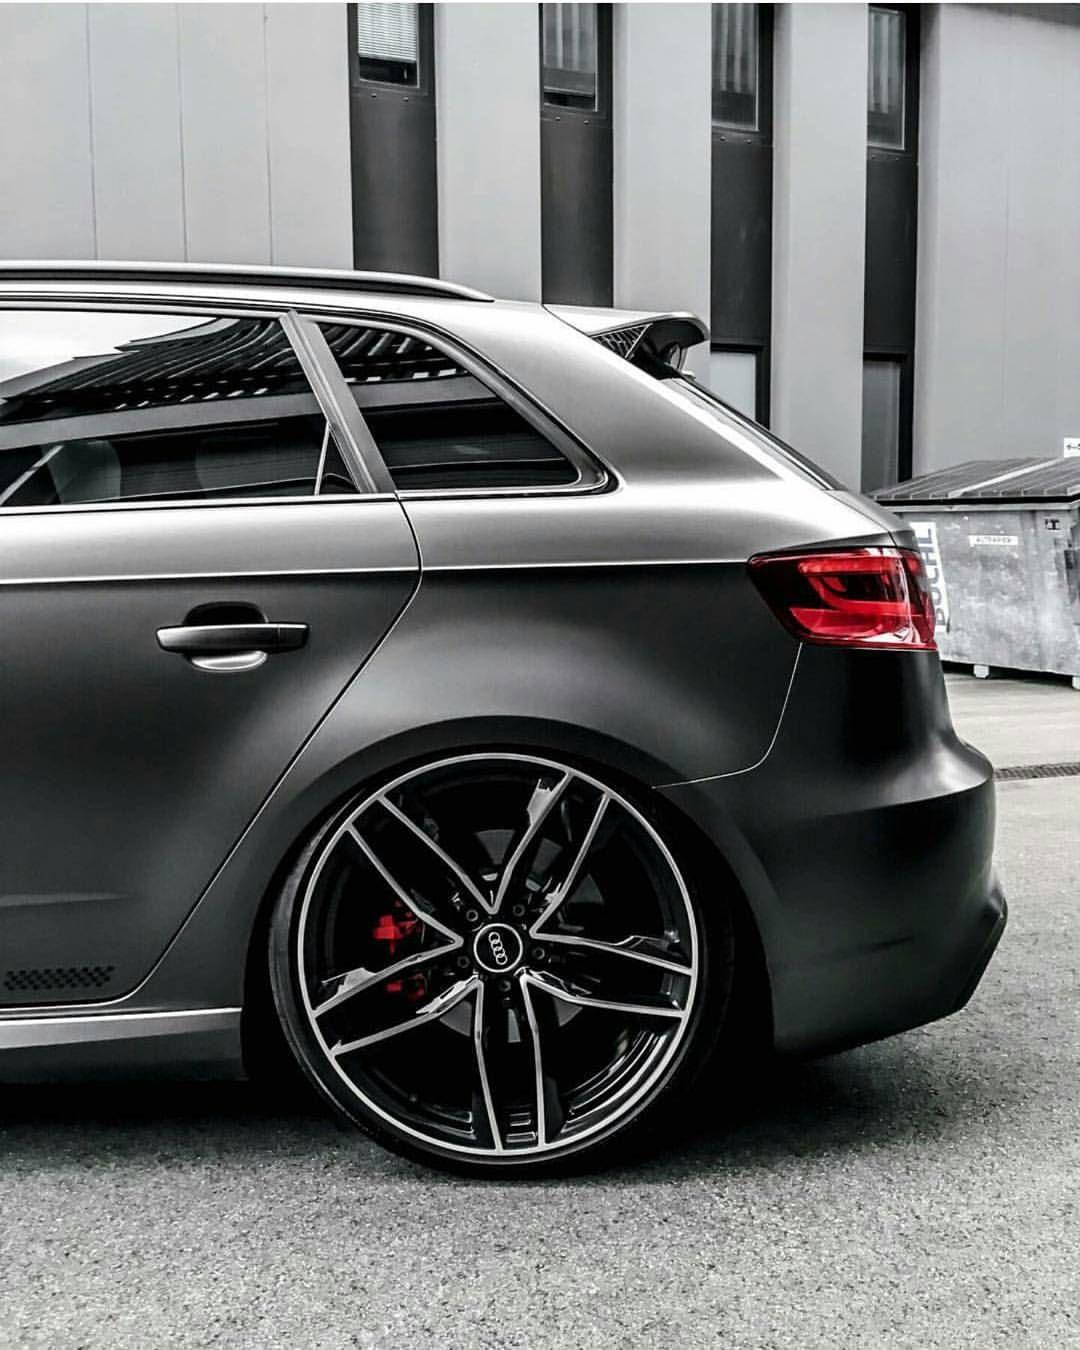 Audi A3 Niche Essen - M147 Wheels Matte Black  |Audi A3 Sedan Black Rims